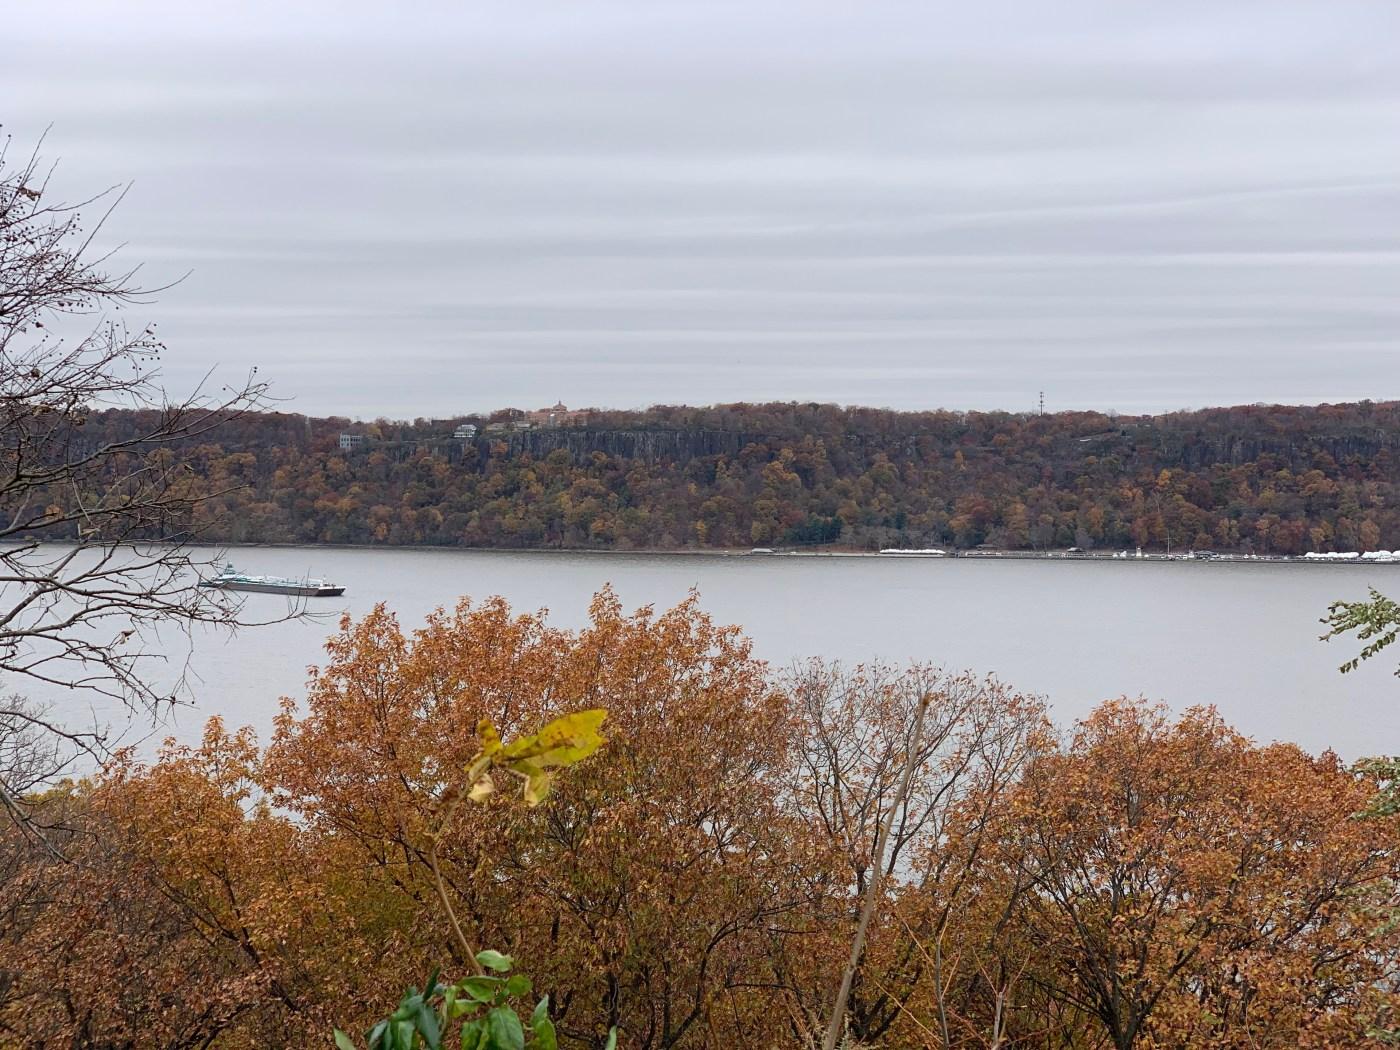 Hudson River Overlook at Inwood Hill Park